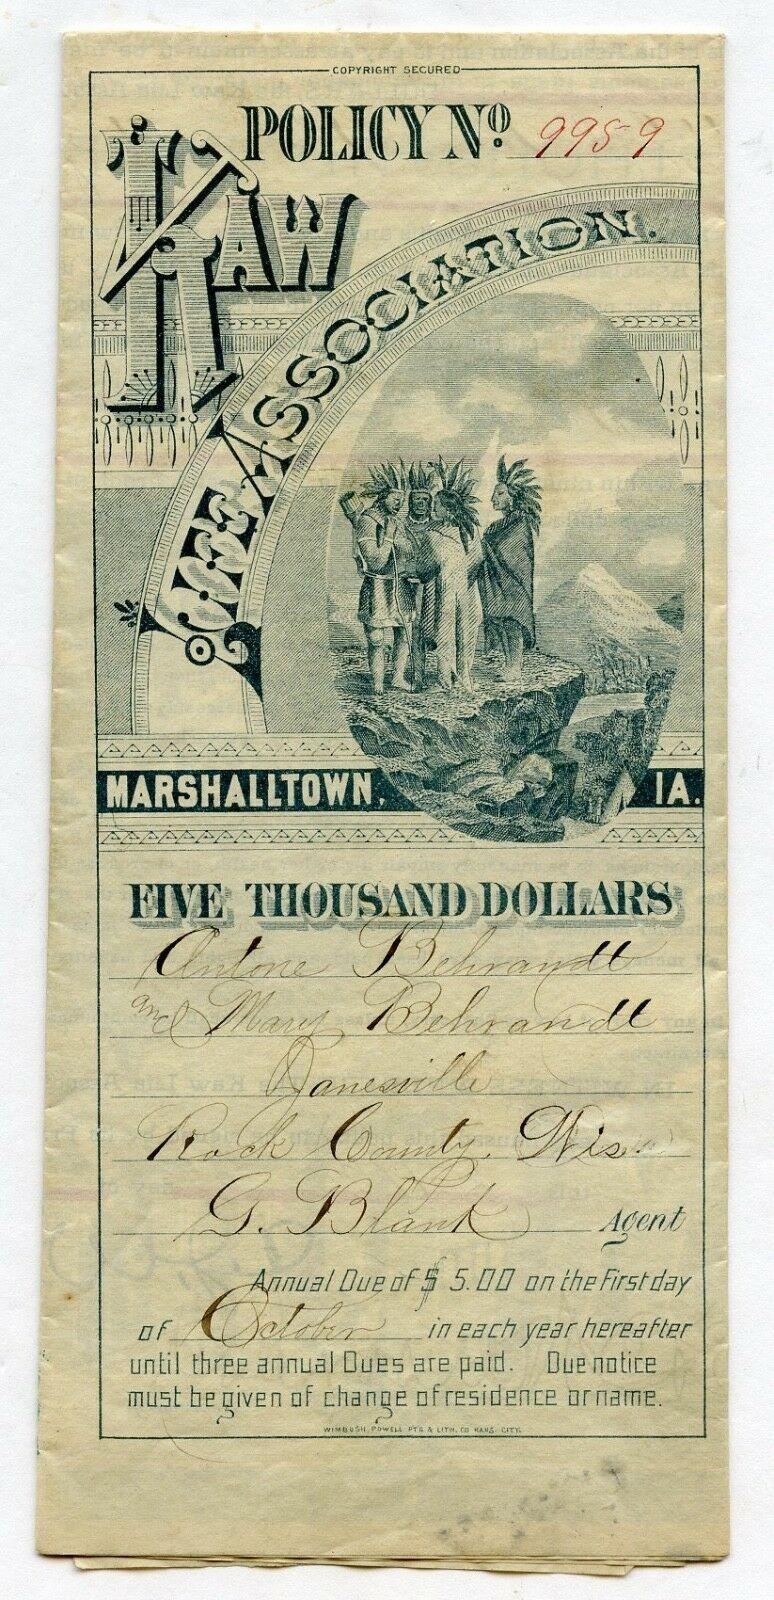 1885 KAW LIFE ASSOCIATION $5000 POLICY -MARSHALLTOWN IA IOWA ADVERTISI.jpg